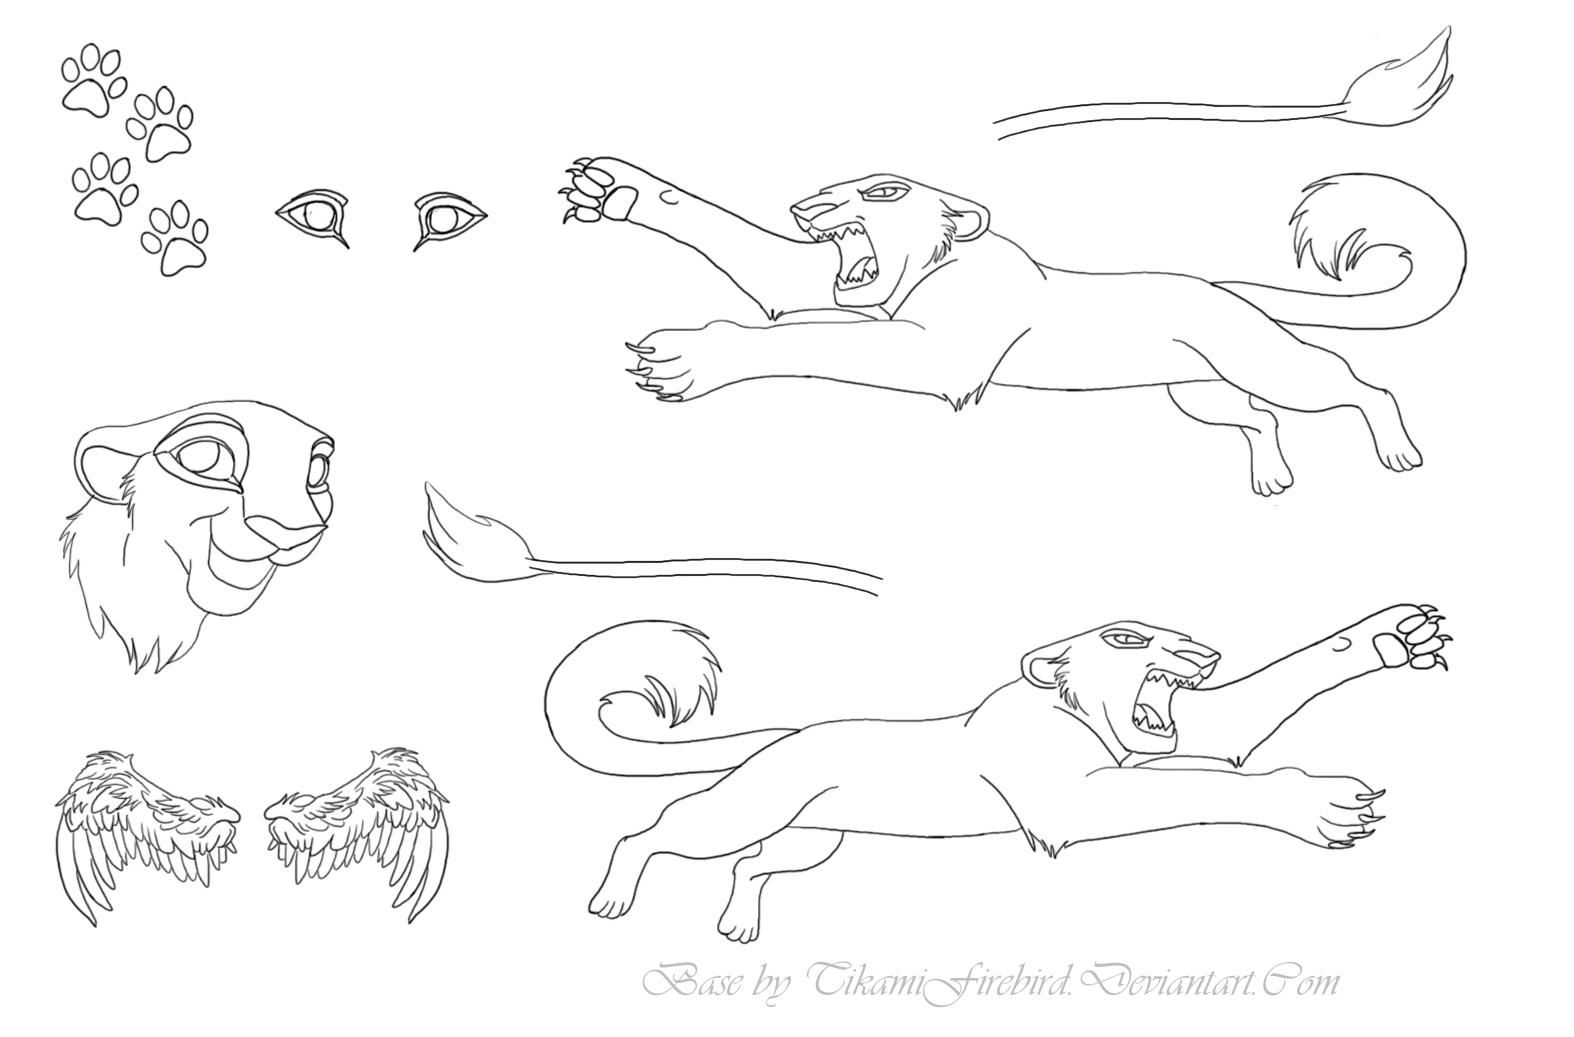 Lion_Tiger_Big_Cat_Ref_Sheet_by_tikamifirebird.png